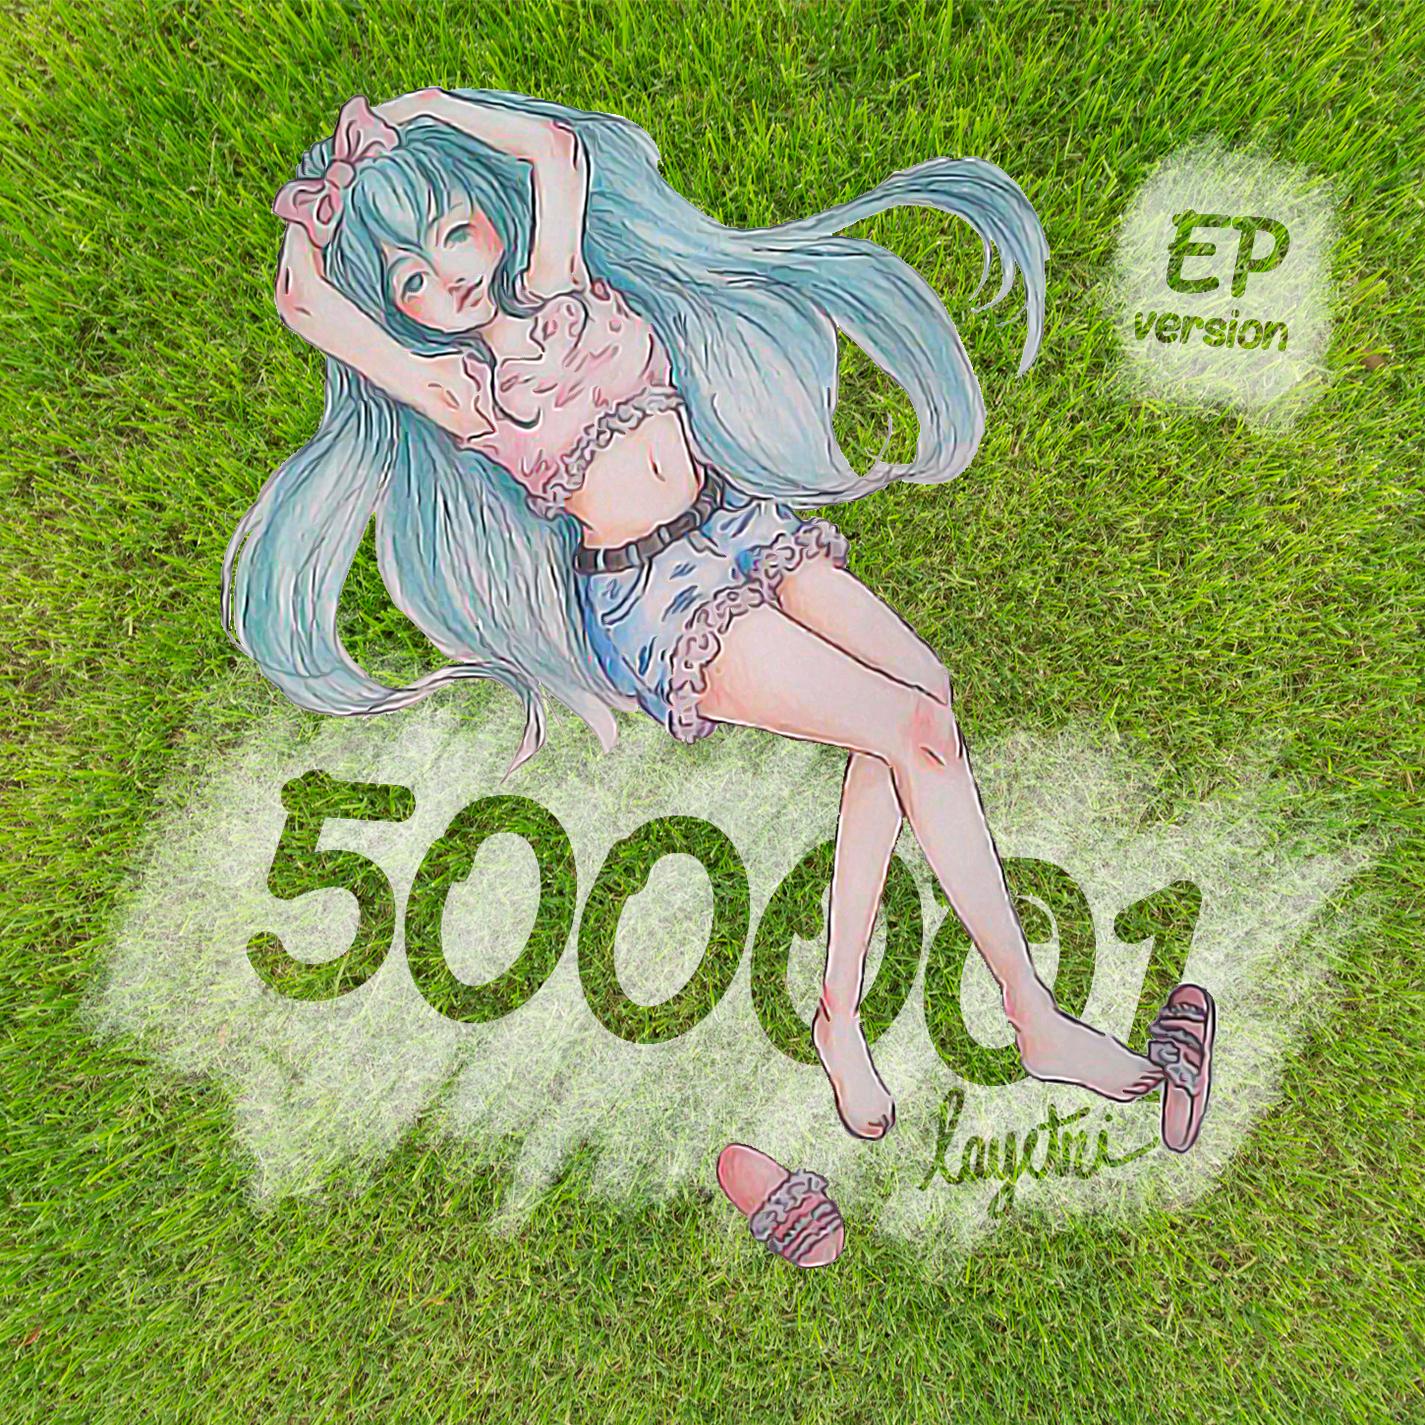 500001 (EP Edition) (album)